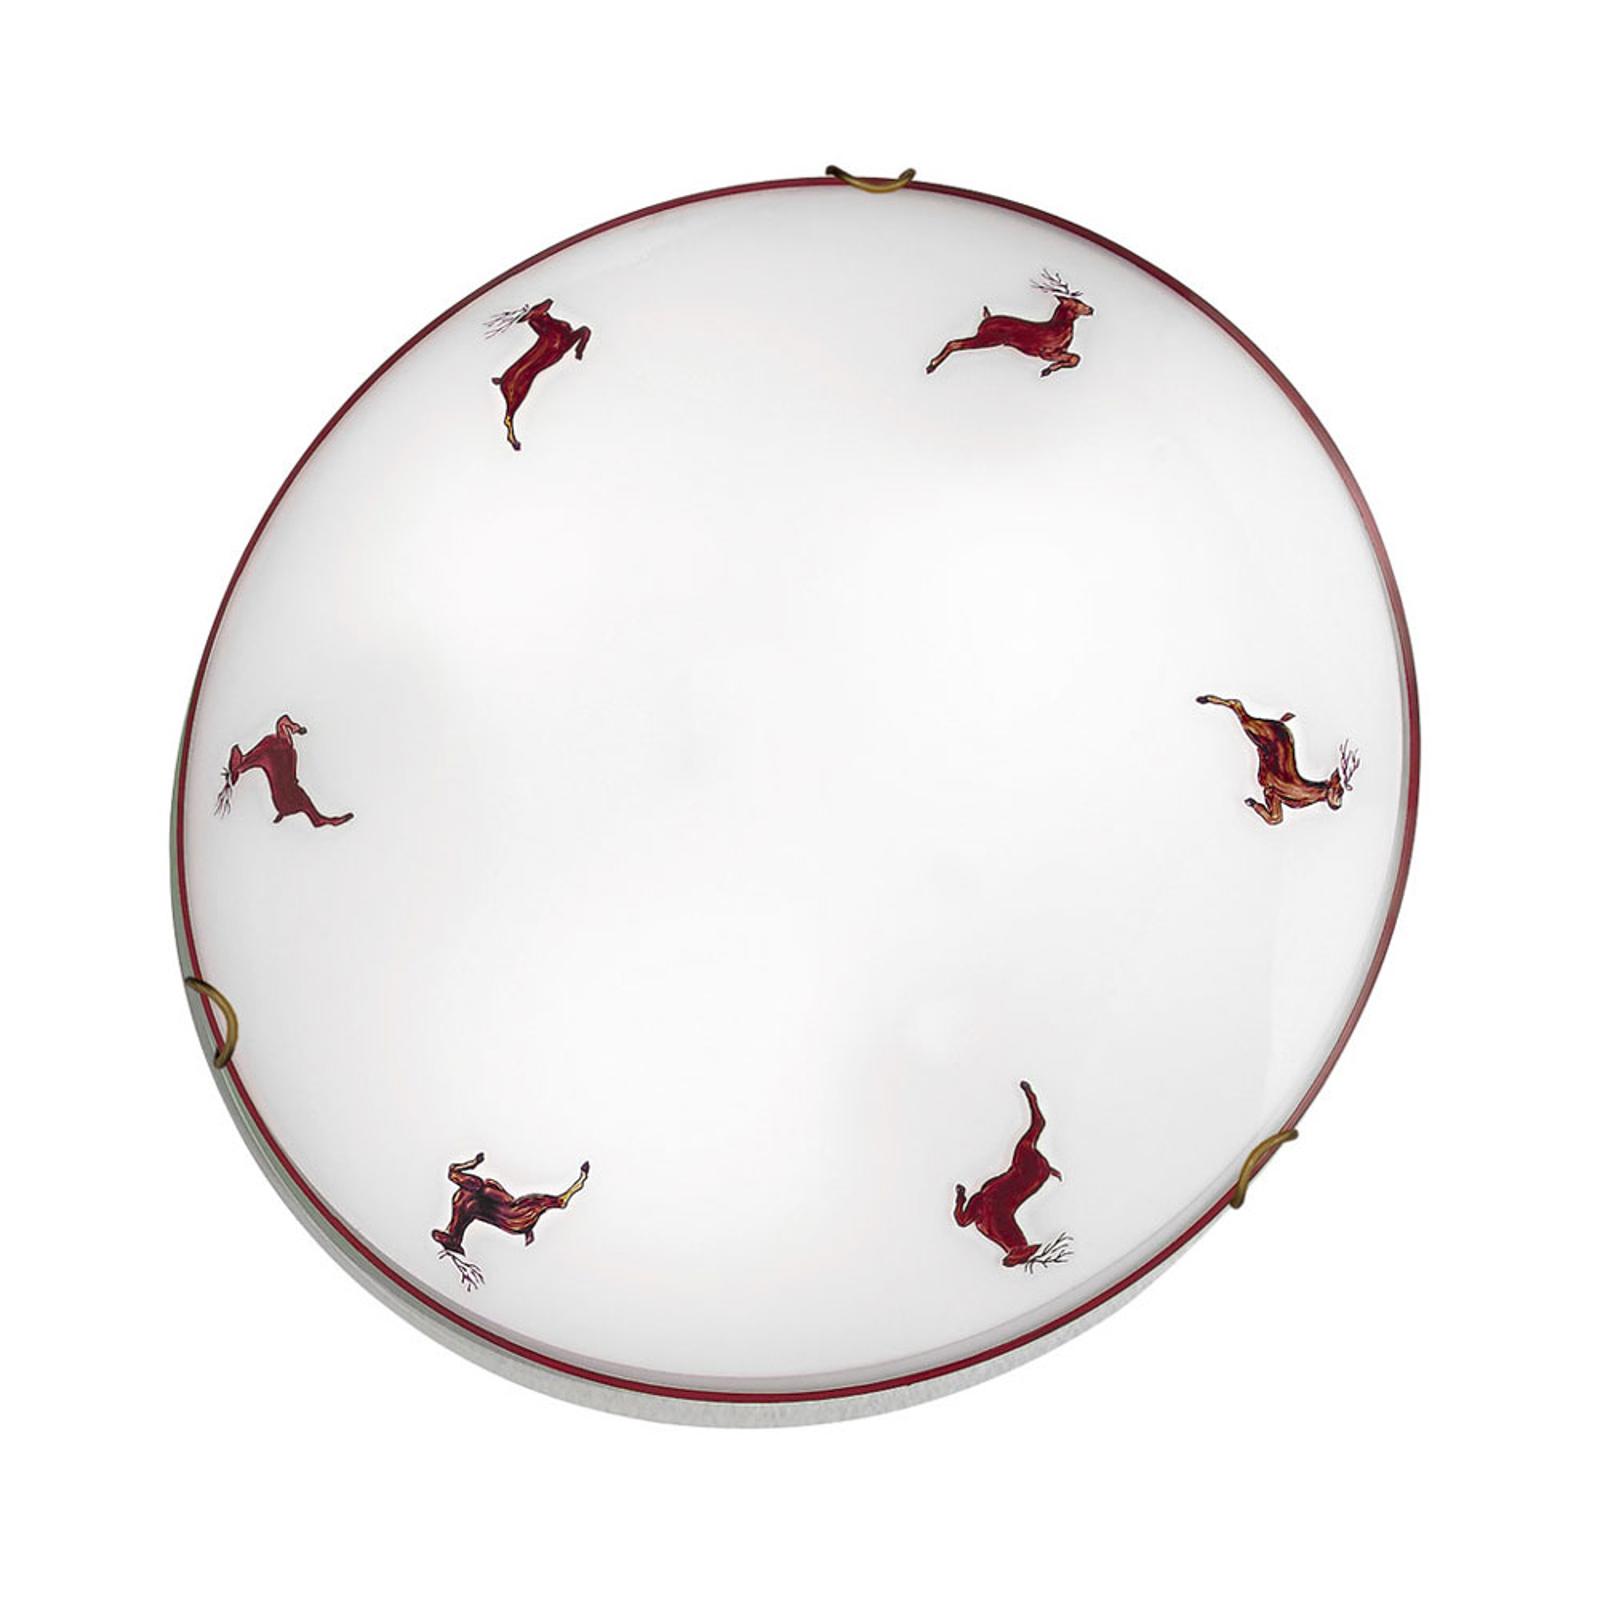 Plafondlamp Nonna hert, wit-rood, Ø 40 cm